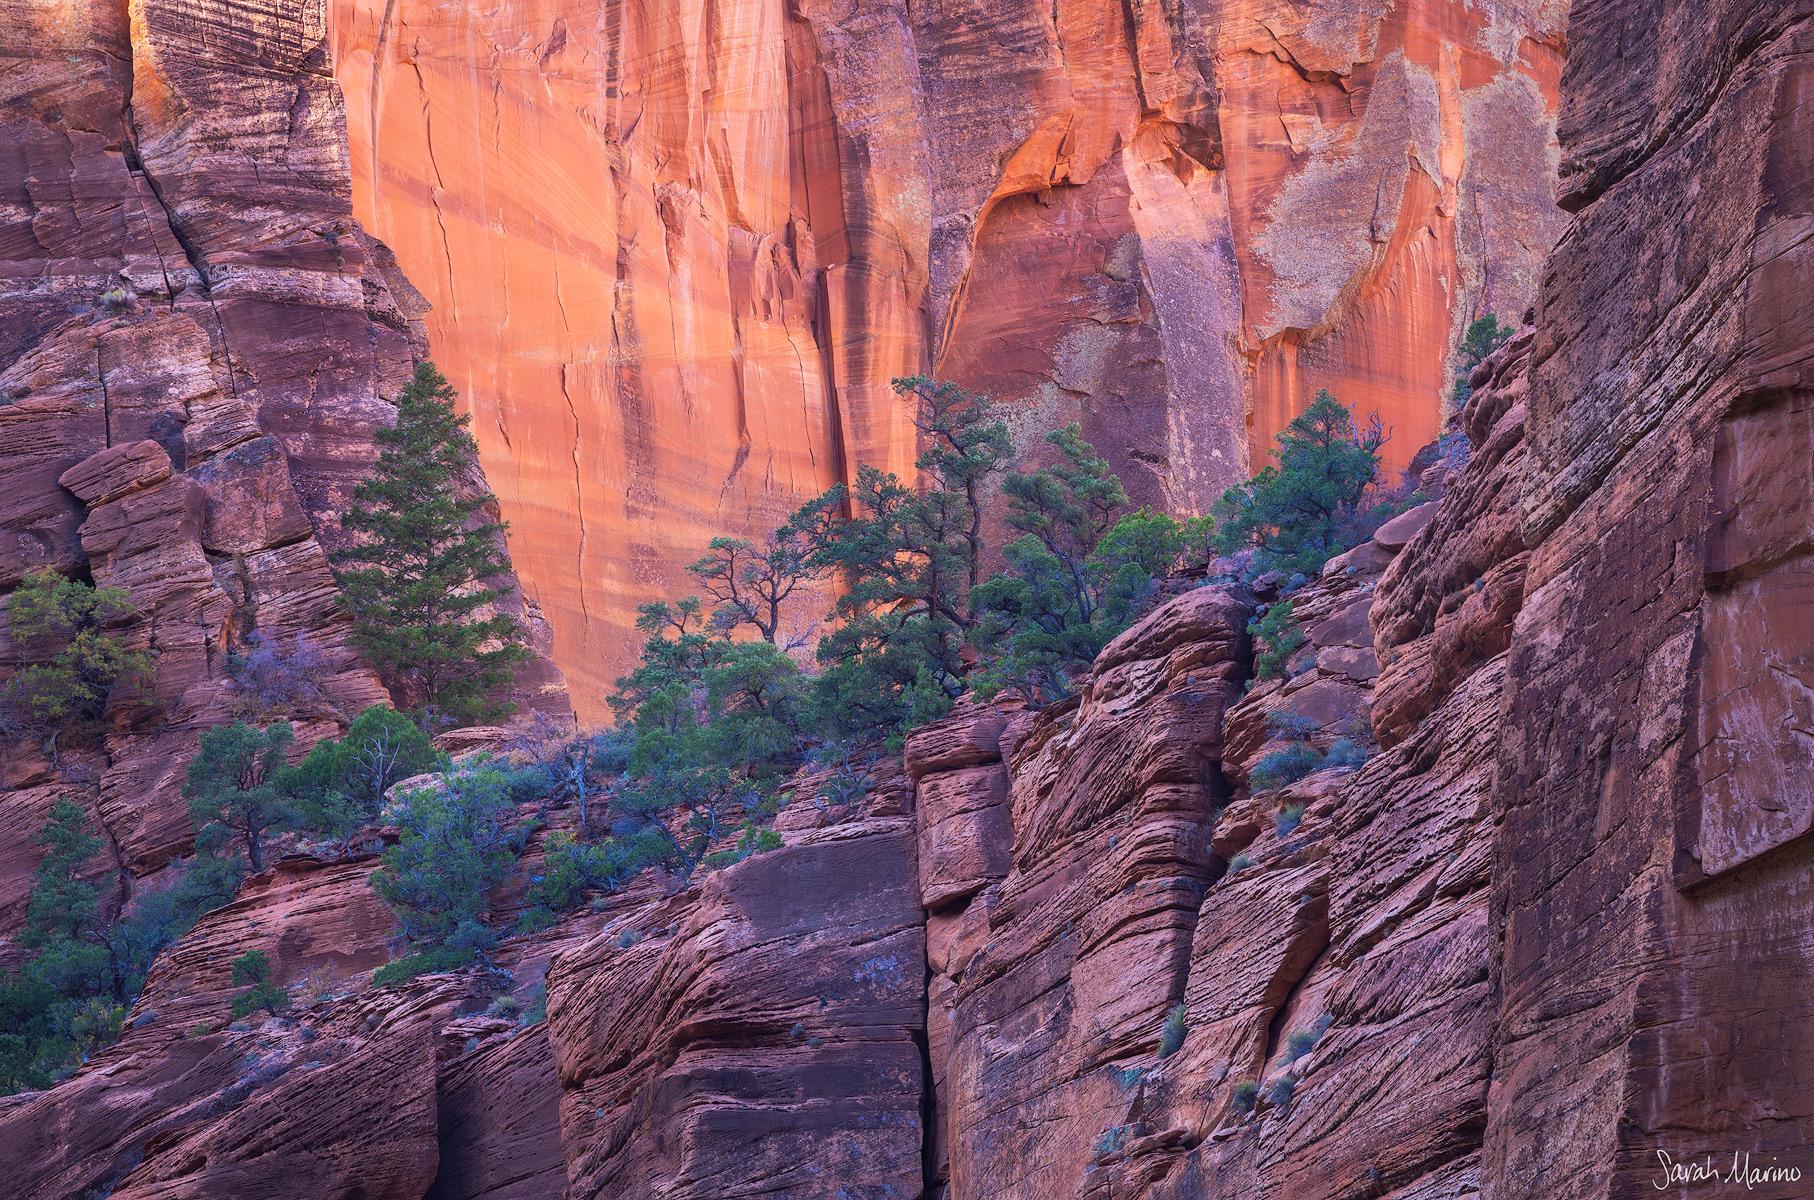 Sarah-Marino-Zion-Perch-Trees-Sandstone-1200px-Watermark.jpg